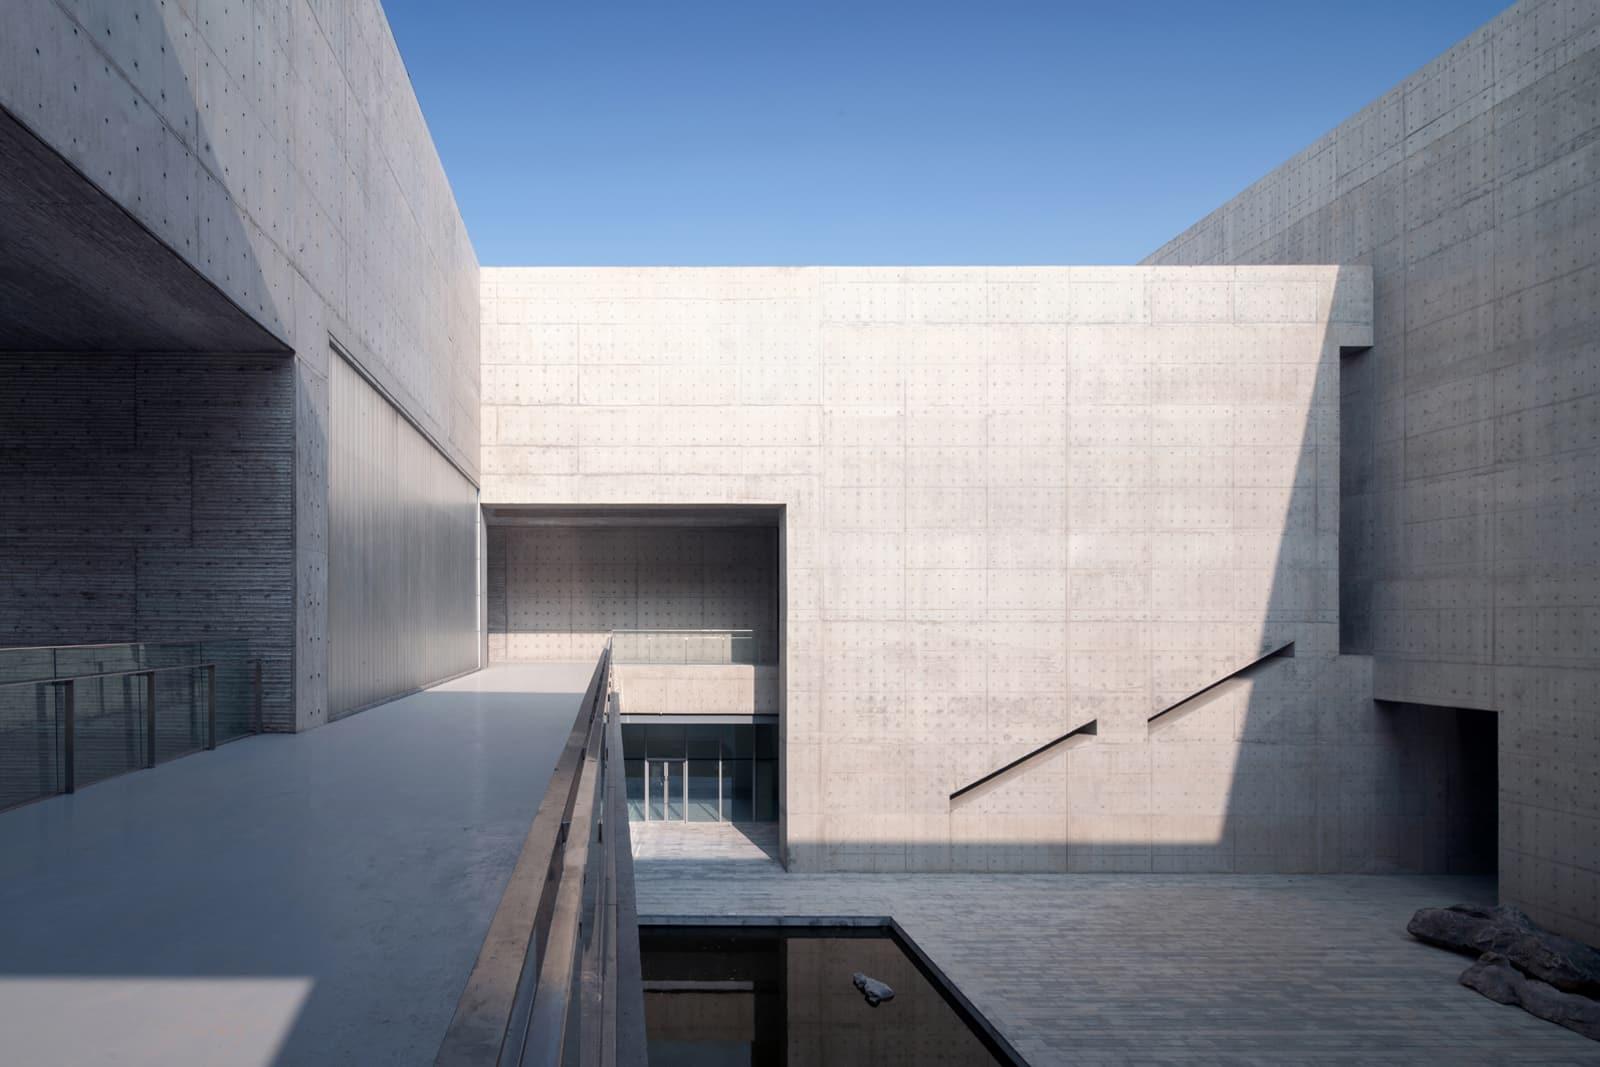 Shou County Culture and Art Center  - 20210702 Zhu Pei ShouCountyCultureArtCenter 07.2 1 43